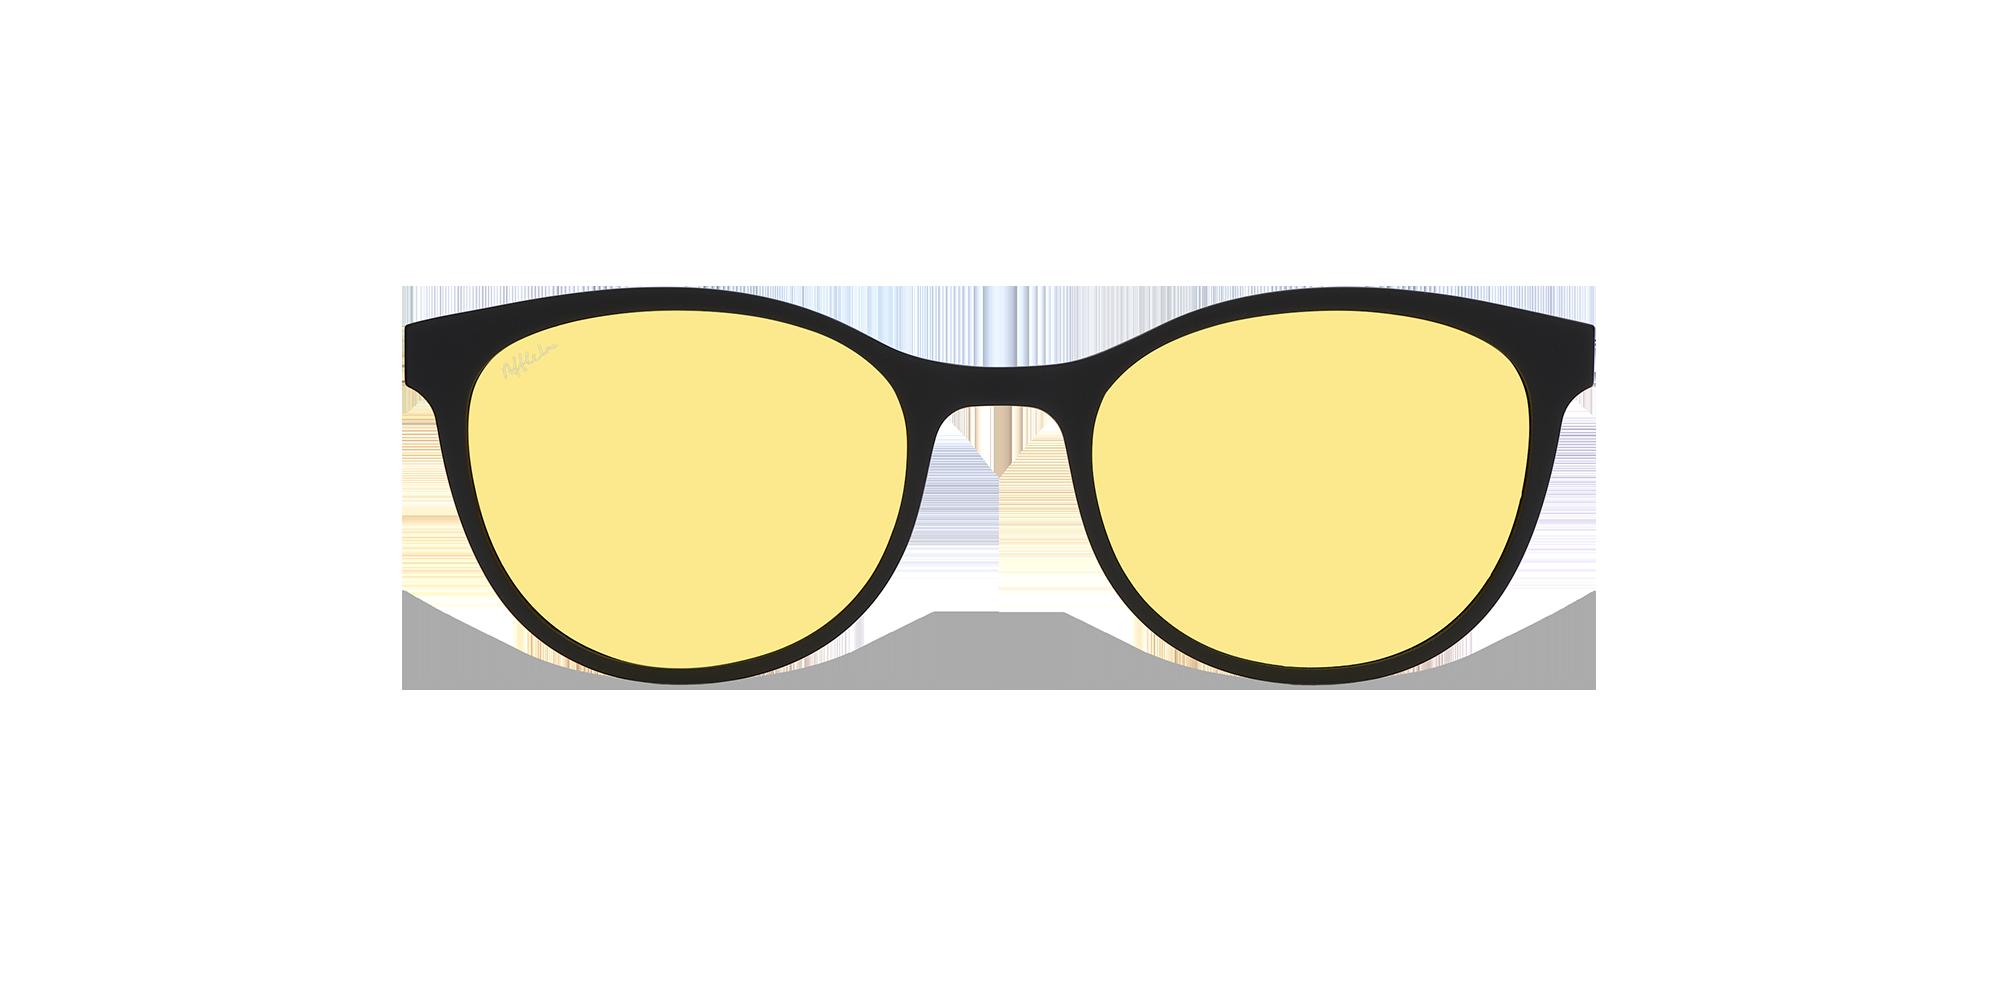 afflelou/france/products/smart_clip/clips_glasses/TMK45YEBK014818.png